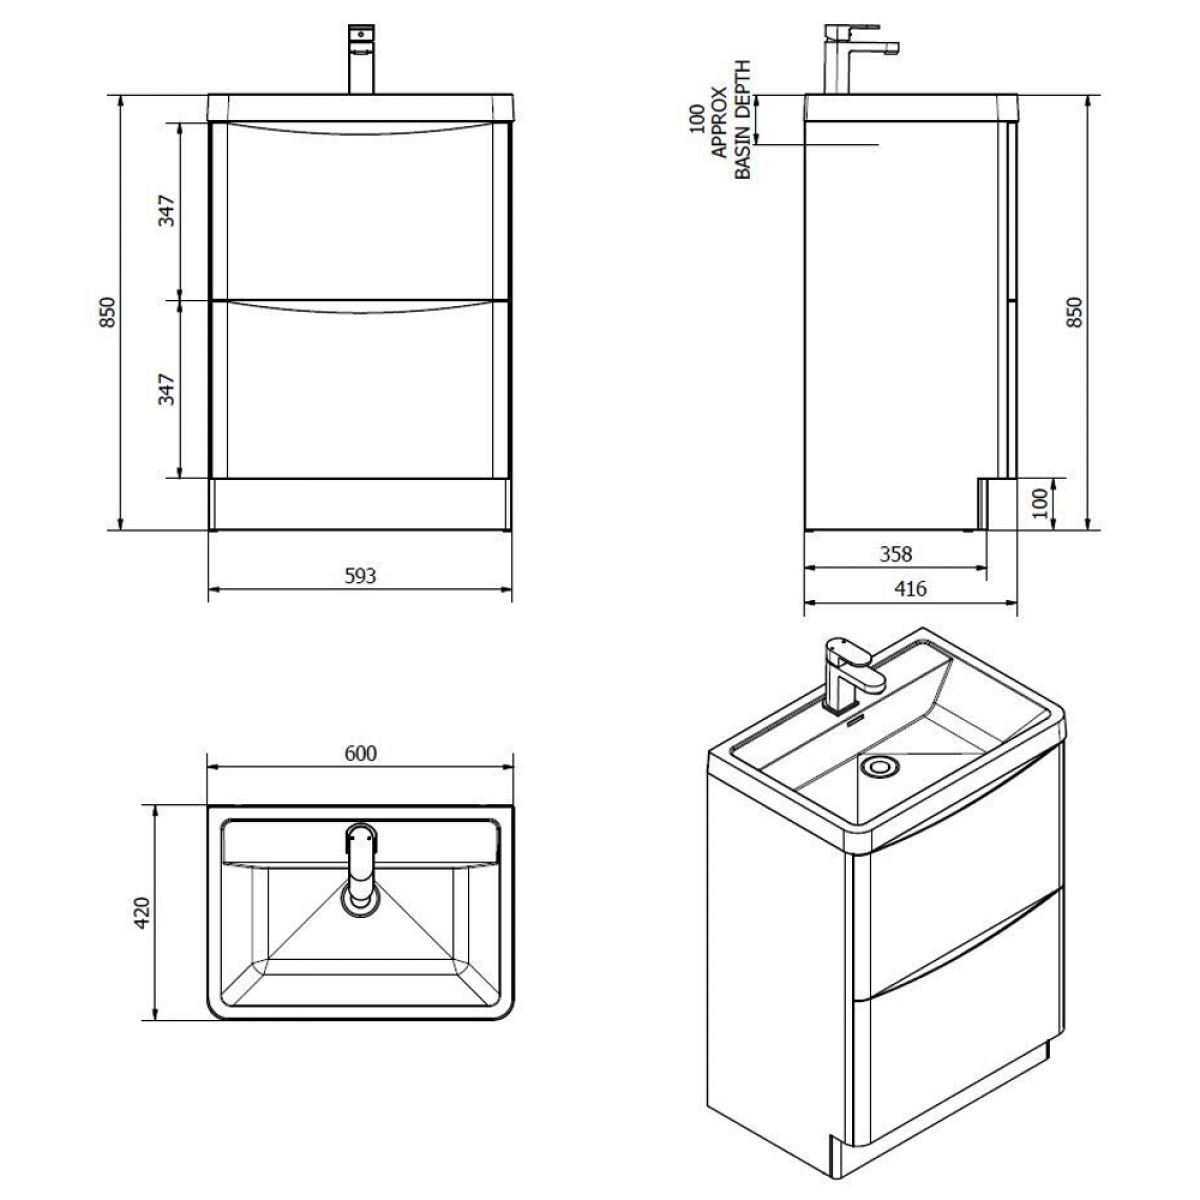 Bali White Ash Floor Standing Vanity Unit 600mm Dimensions